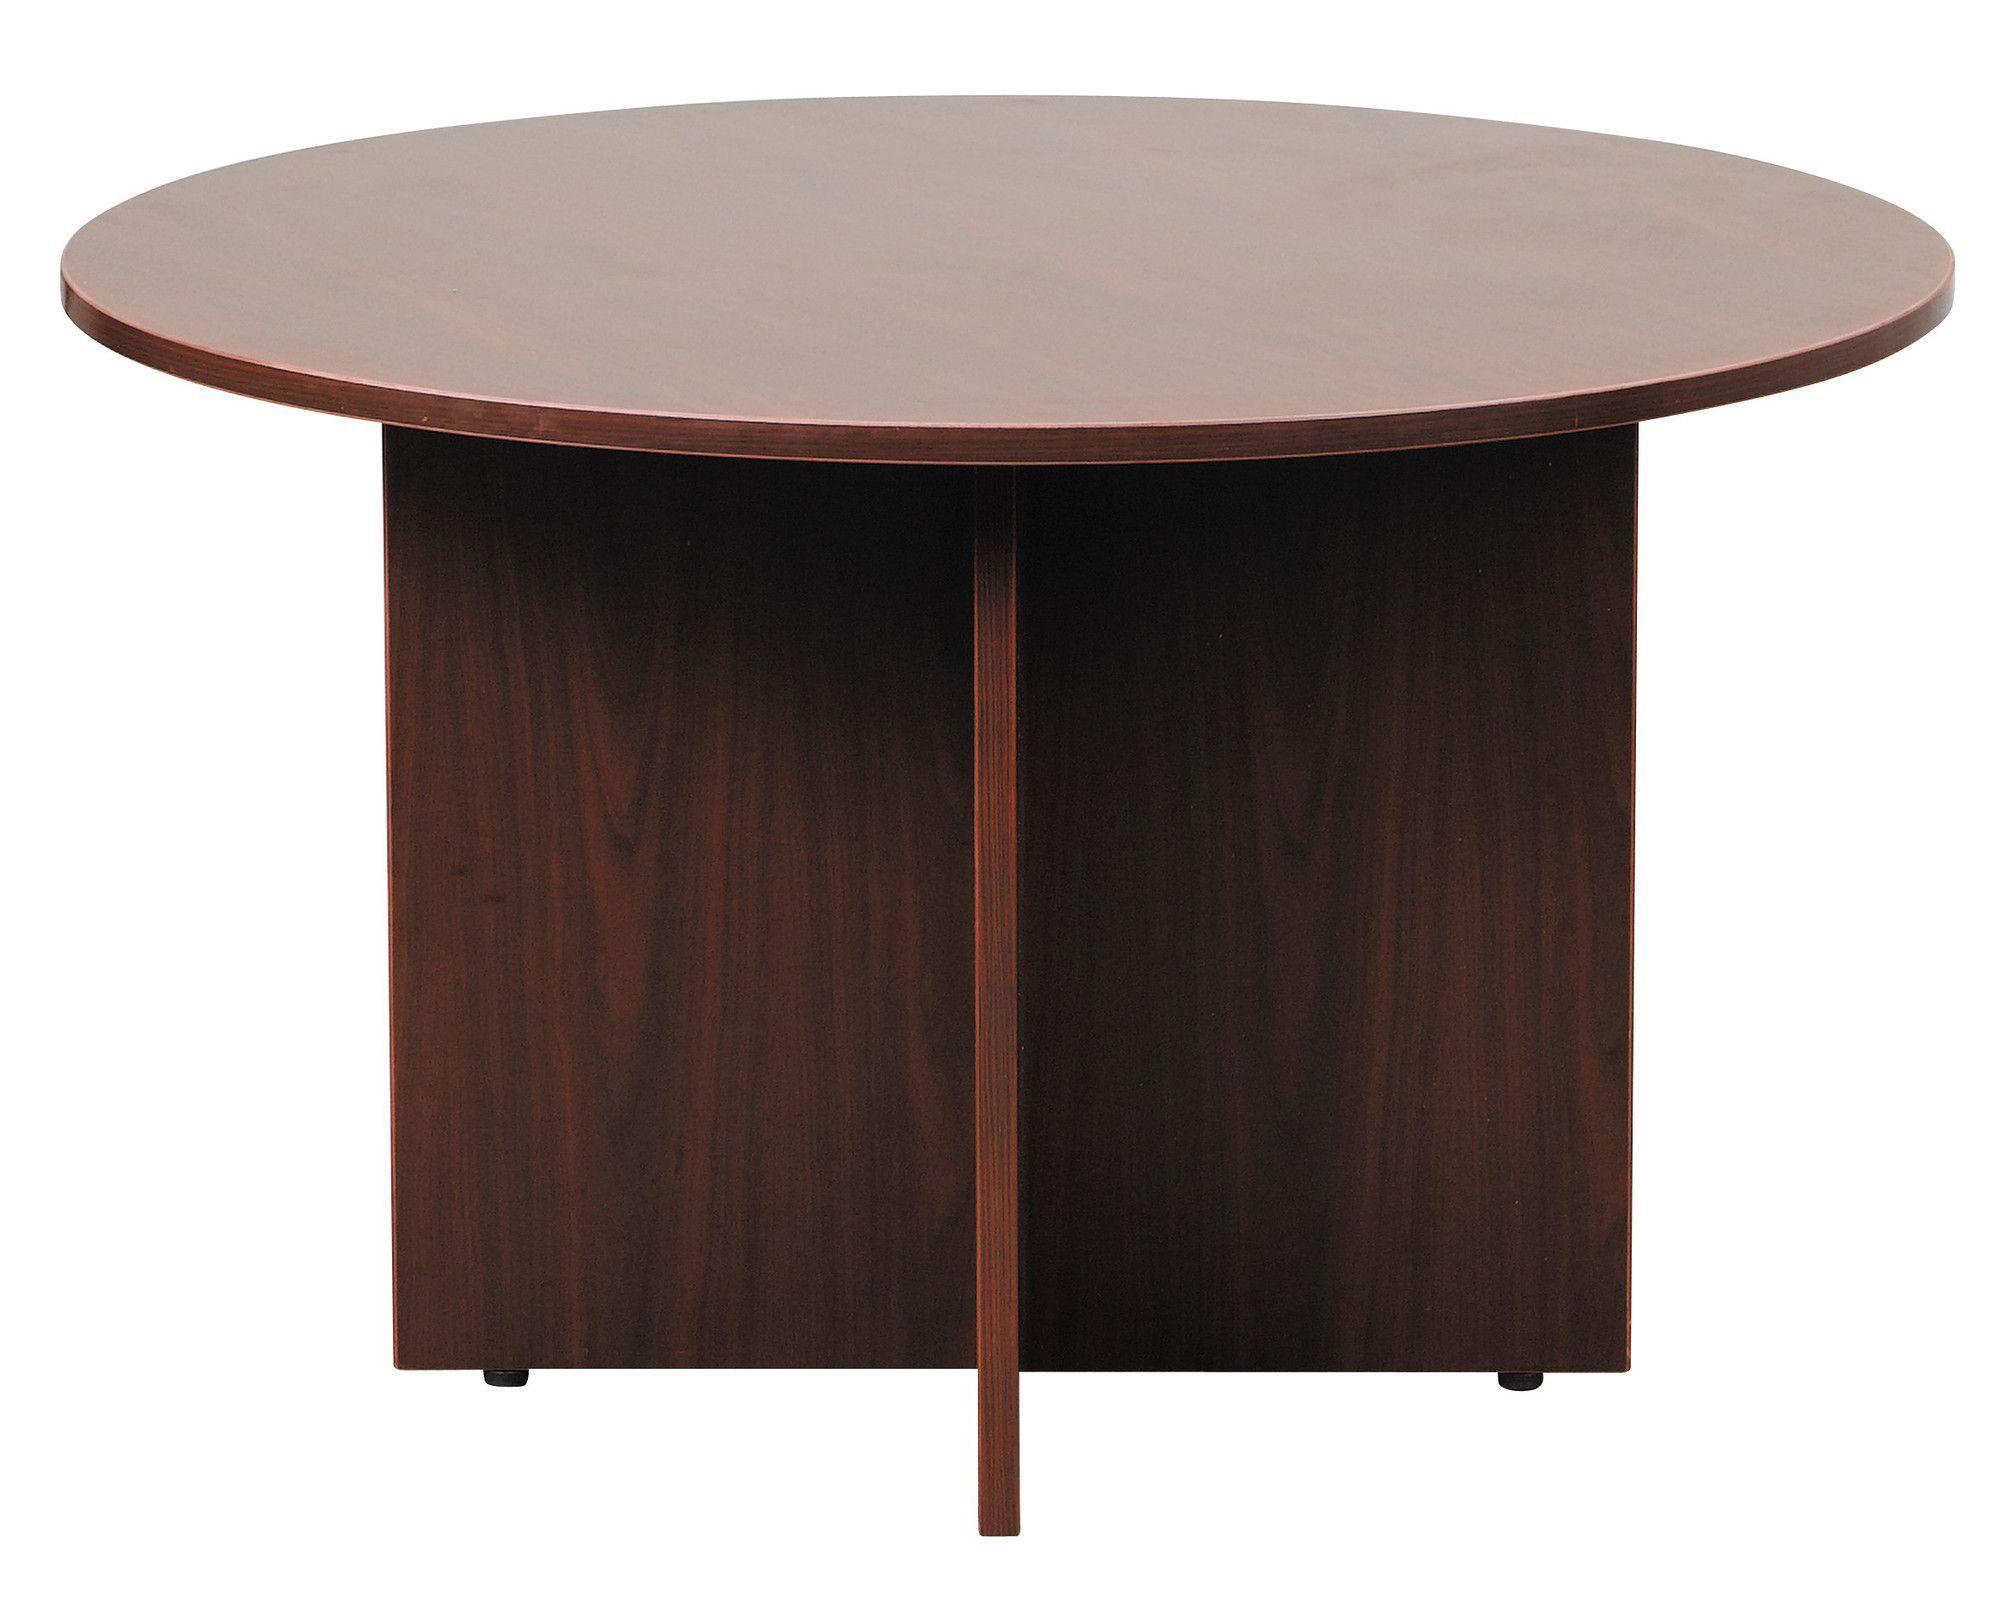 Laminate Series Circular Conference Table